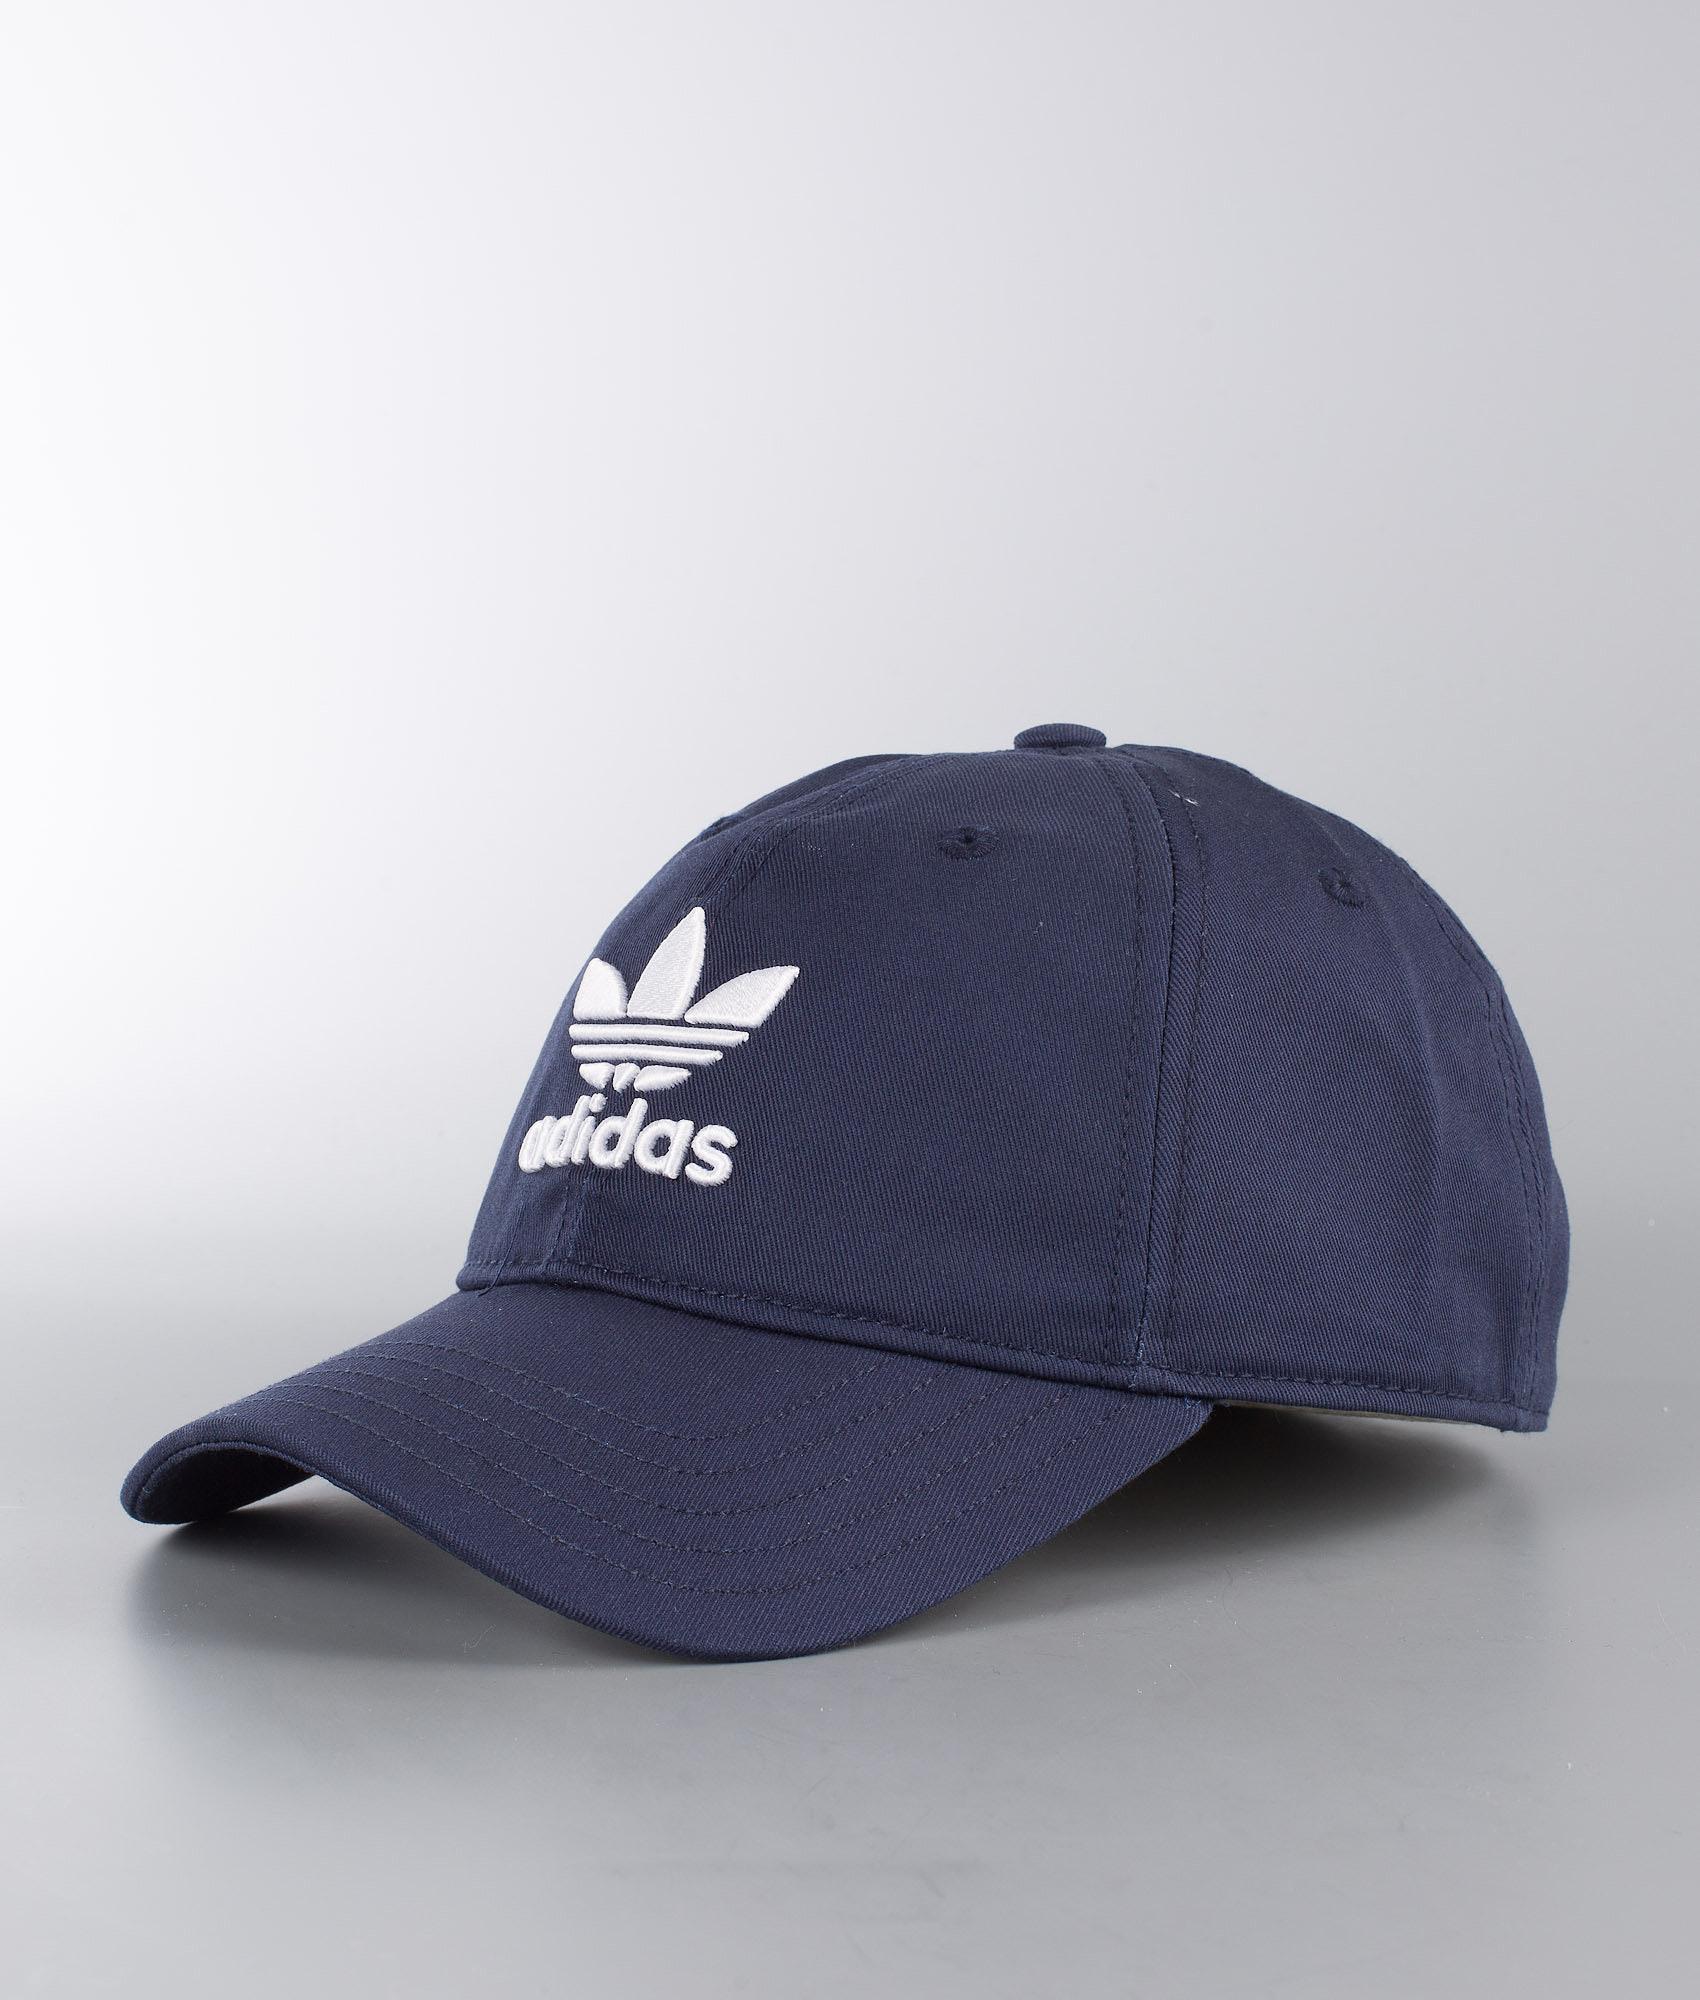 d2510db6a6f08 Adidas Originals Trefoil Cap Collegiate Navy White - Ridestore.com